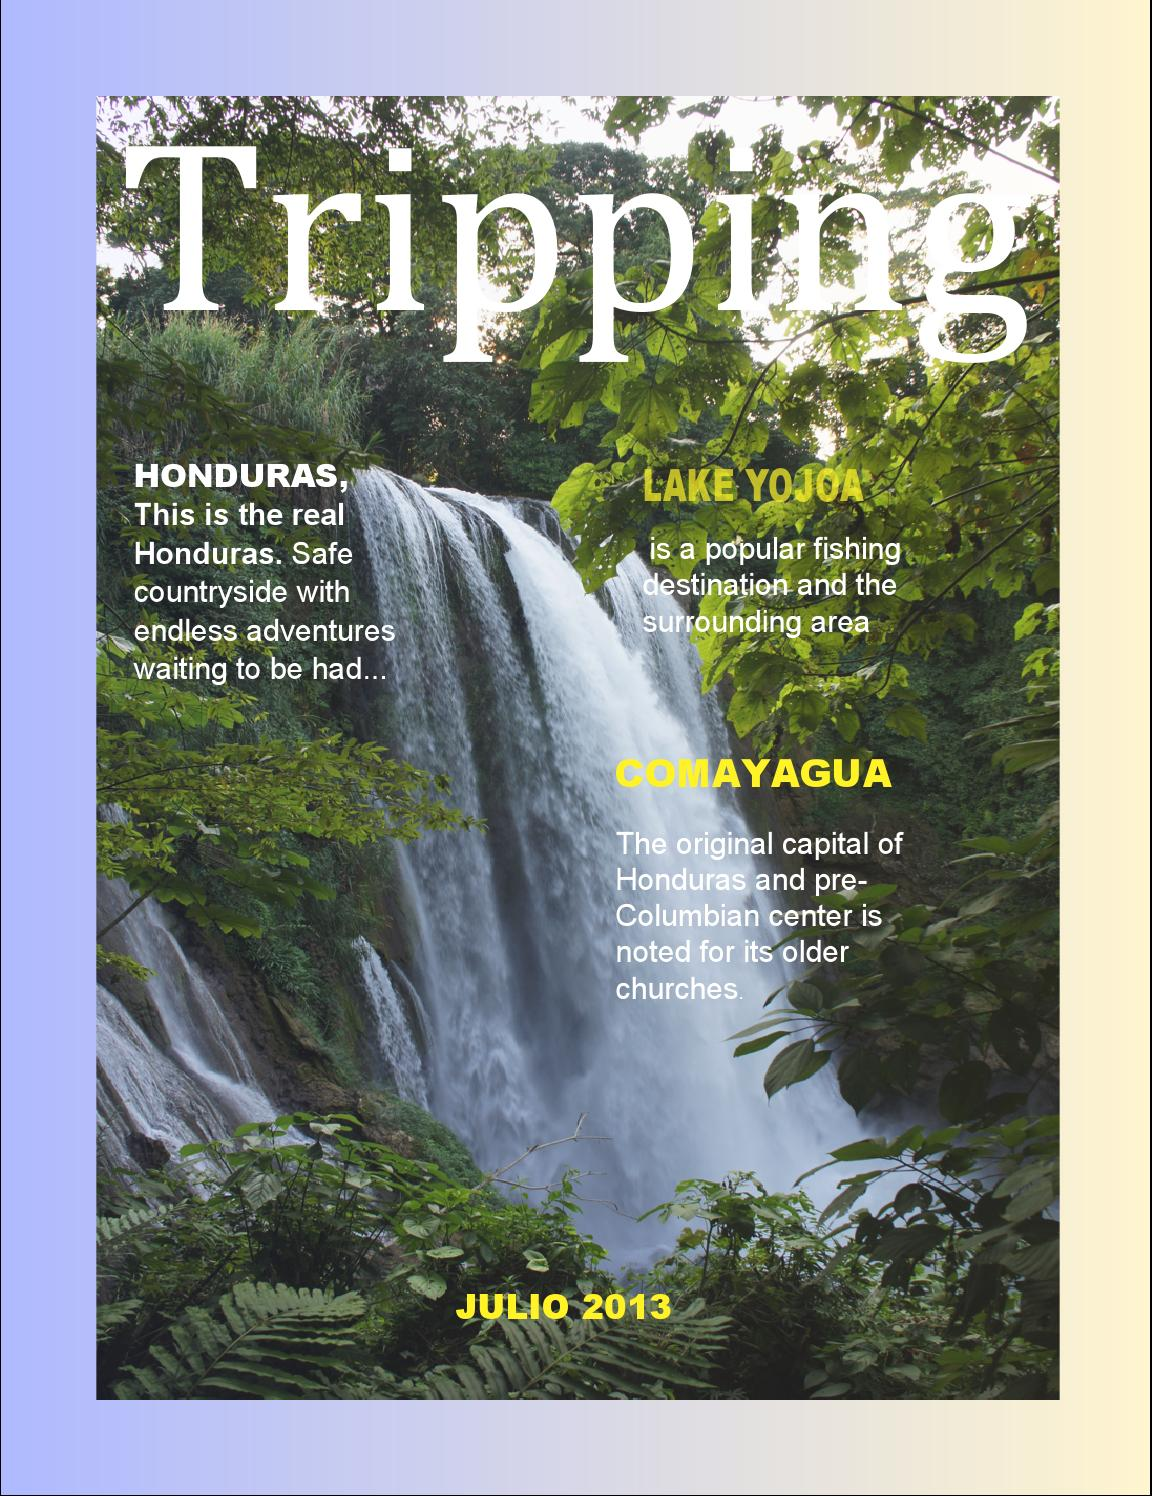 Magazin TRIPPING julio 2013 by Asociación Hoteles - issuu